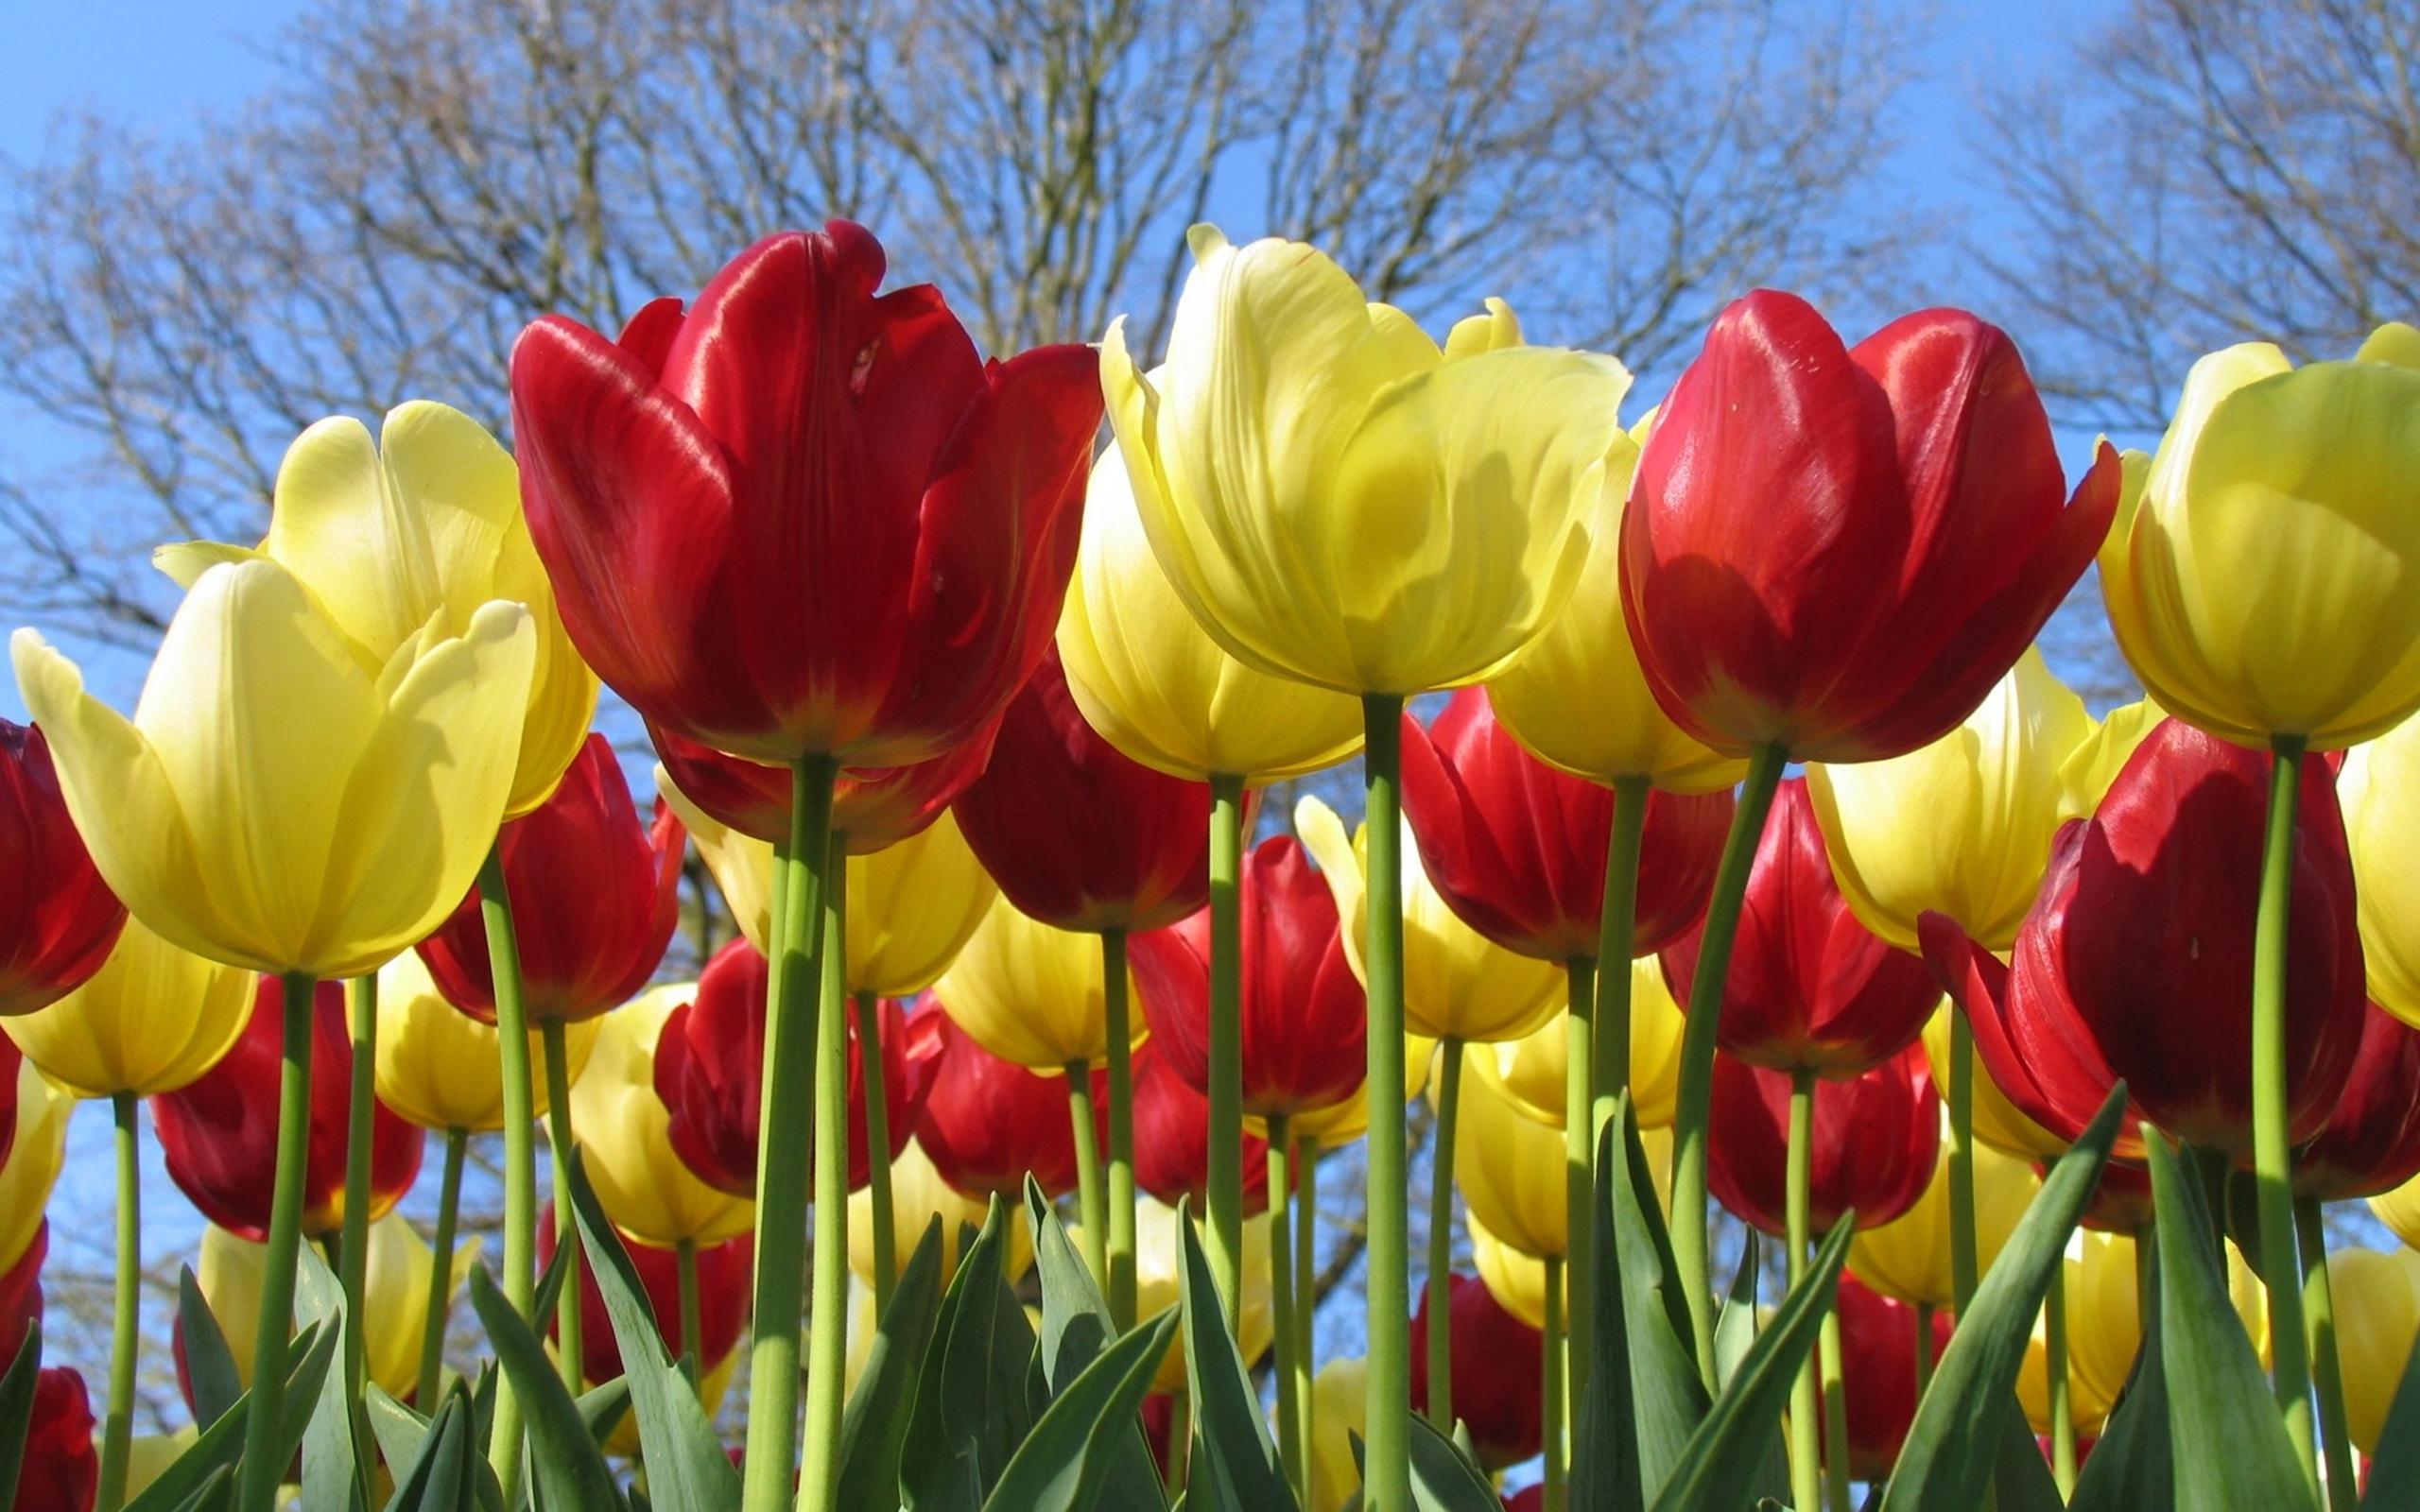 Flower Red Flower Tulip Yellow Flower 2560x1600